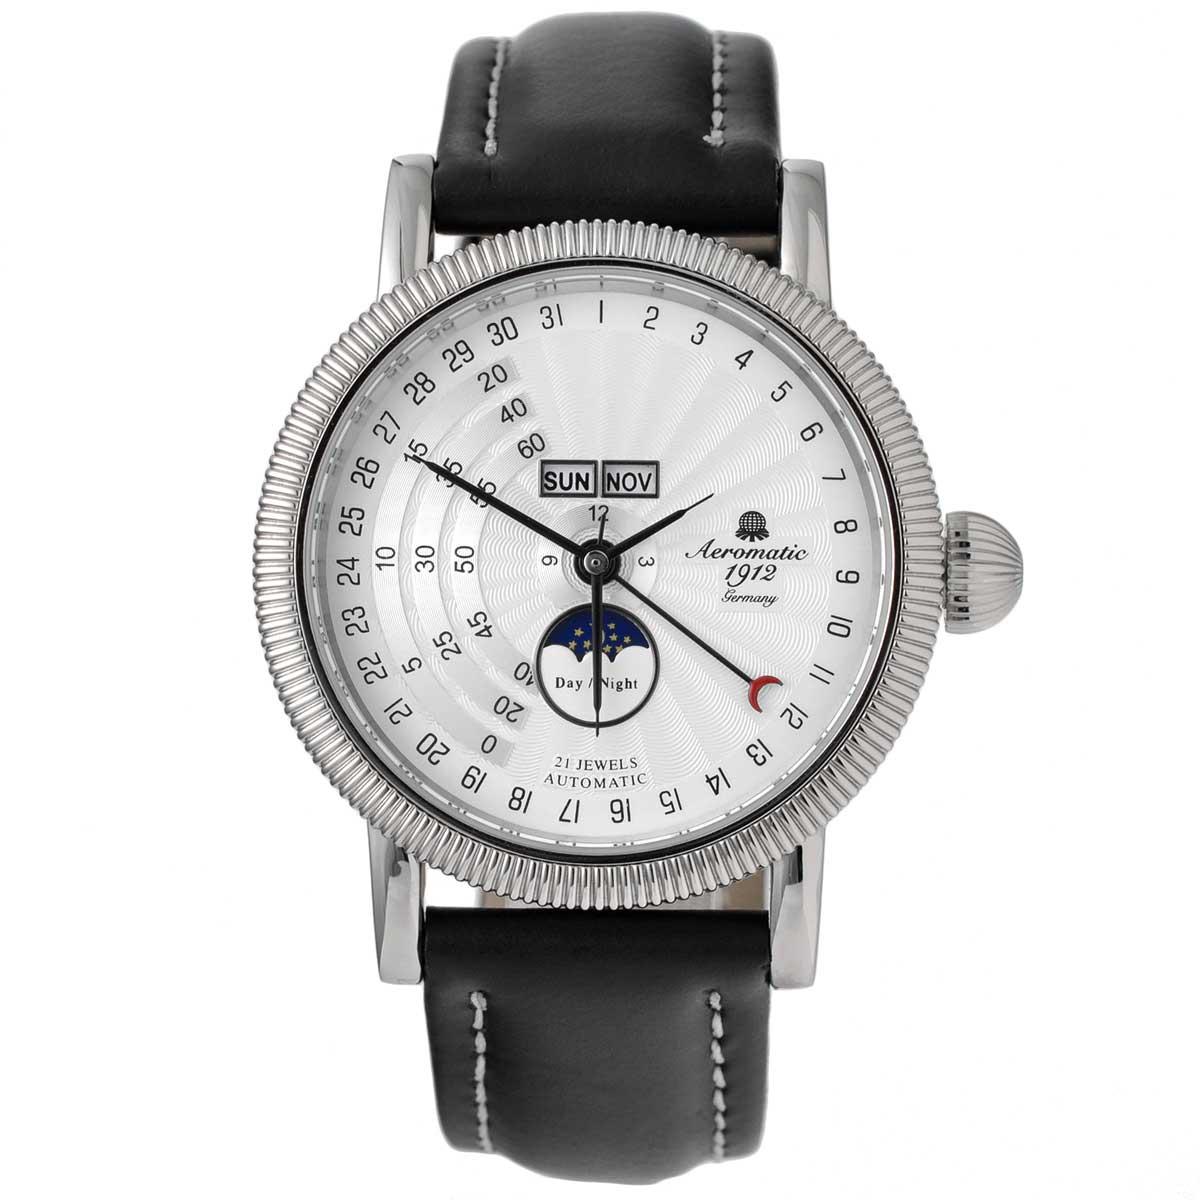 Aeromatic 1912 エアロマティック 1912 エアロマチック 1912 自動巻き 腕時計 メンズ パイロットウォッチ [A1281] 並行輸入品 メーカー保証24ヶ月&純正ケース付き